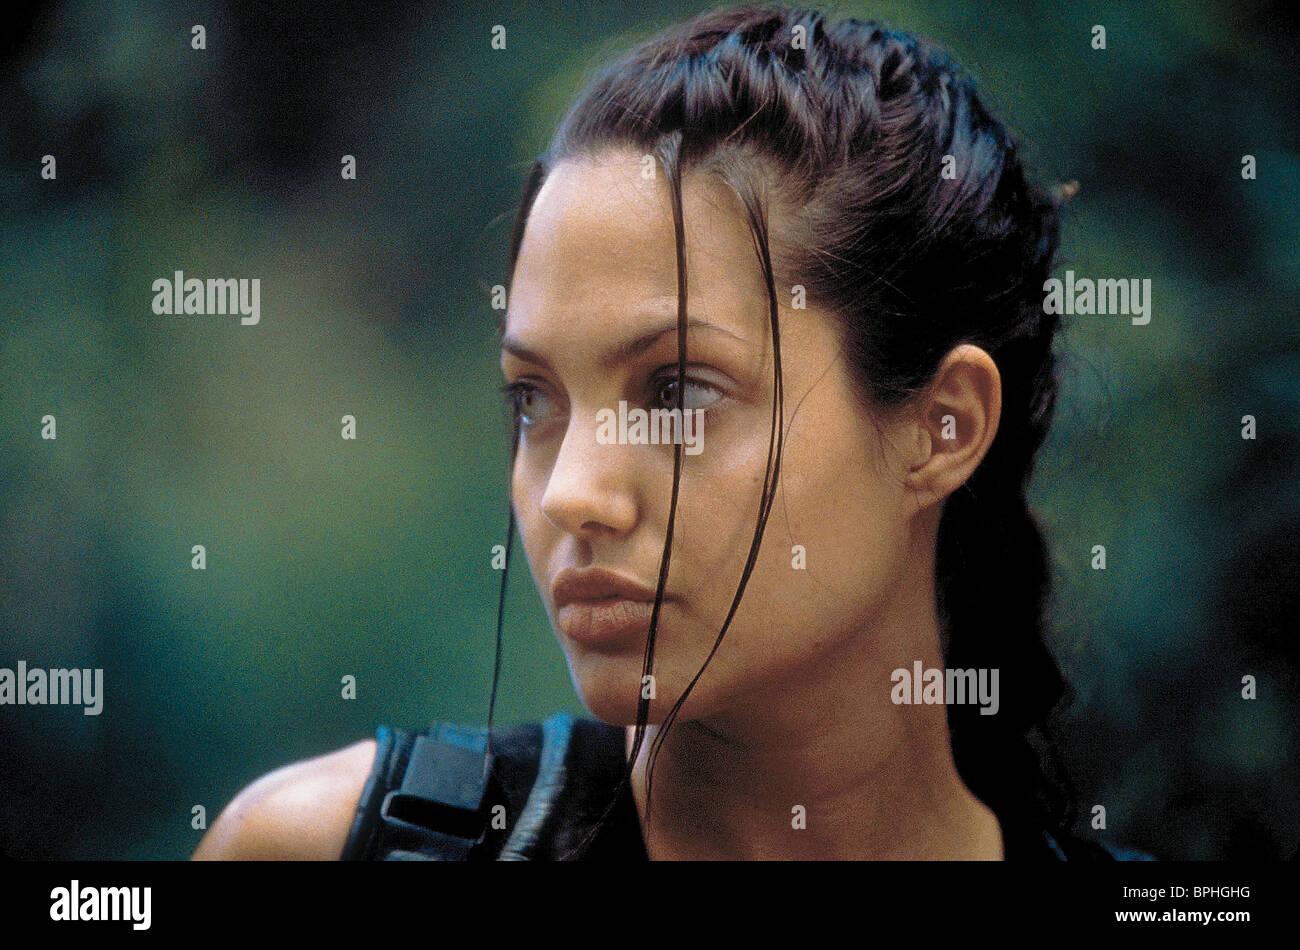 ANGELINA JOLIE LARA CROFT: TOMB RAIDER (2001) - Stock Image